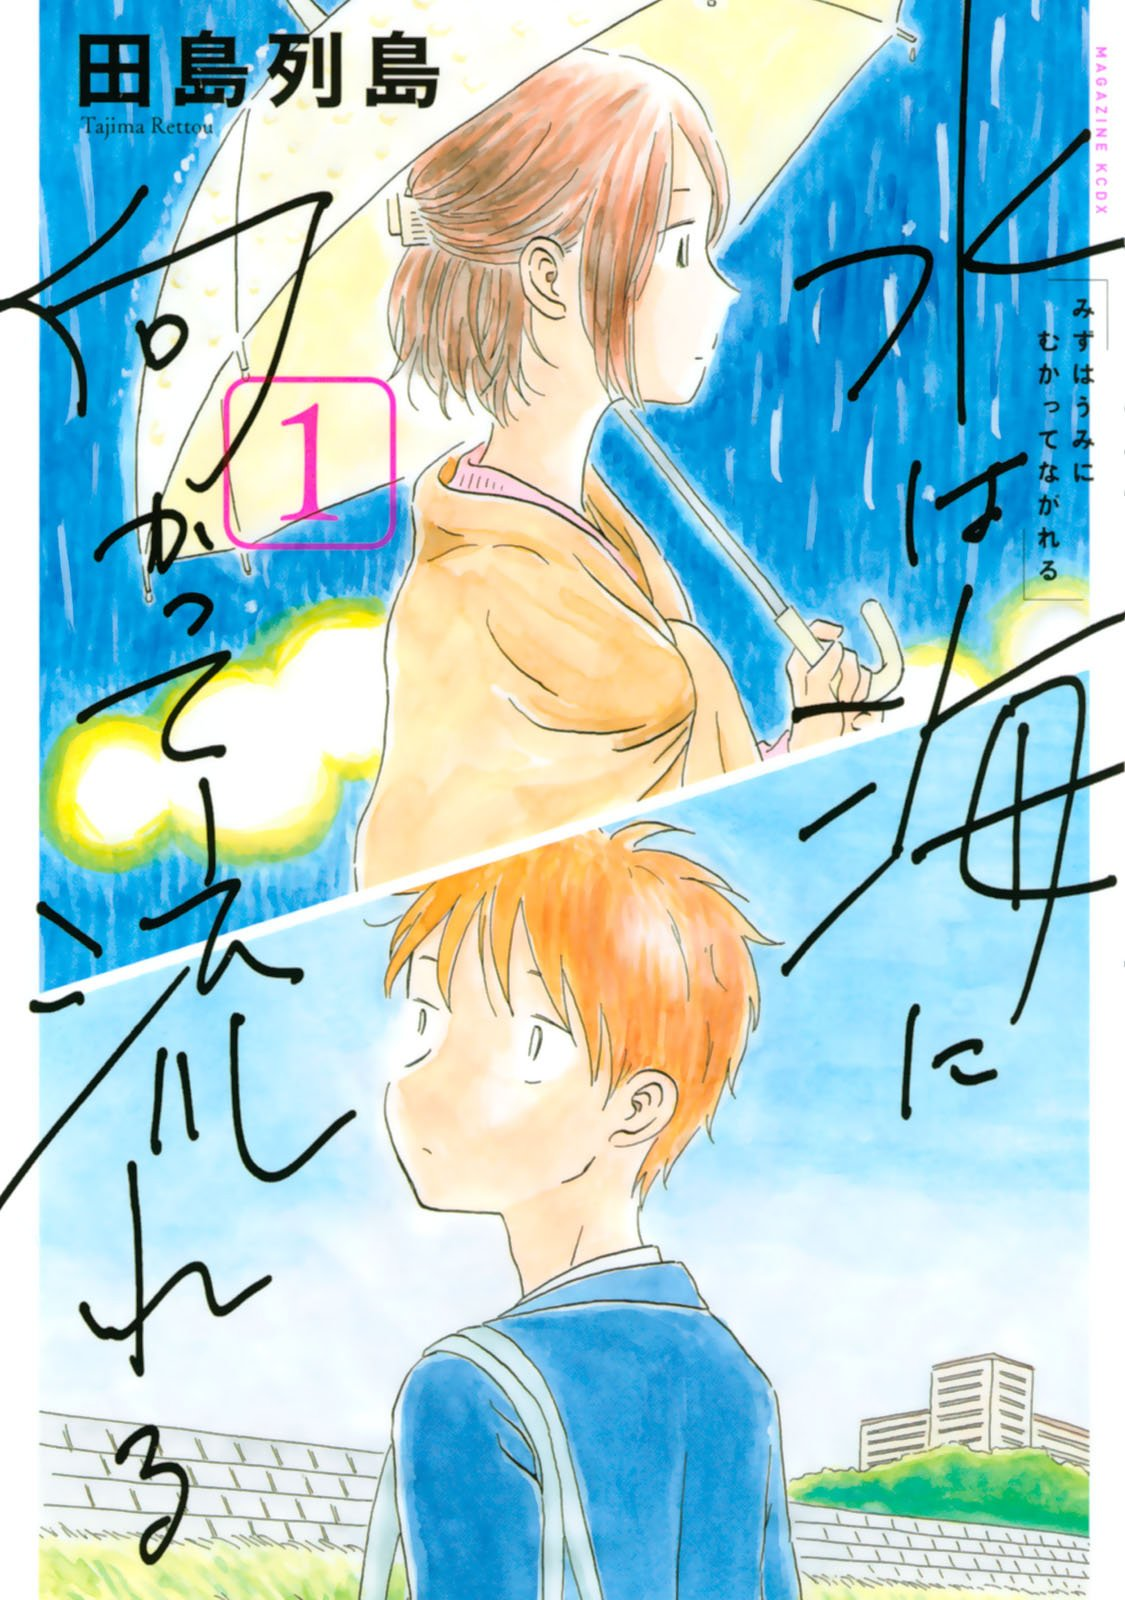 https://nine.mangadogs.com/es_manga/pic8/50/36658/946317/2406a0a94c80406914ff2f6c9fdd67d5.jpg Page 2